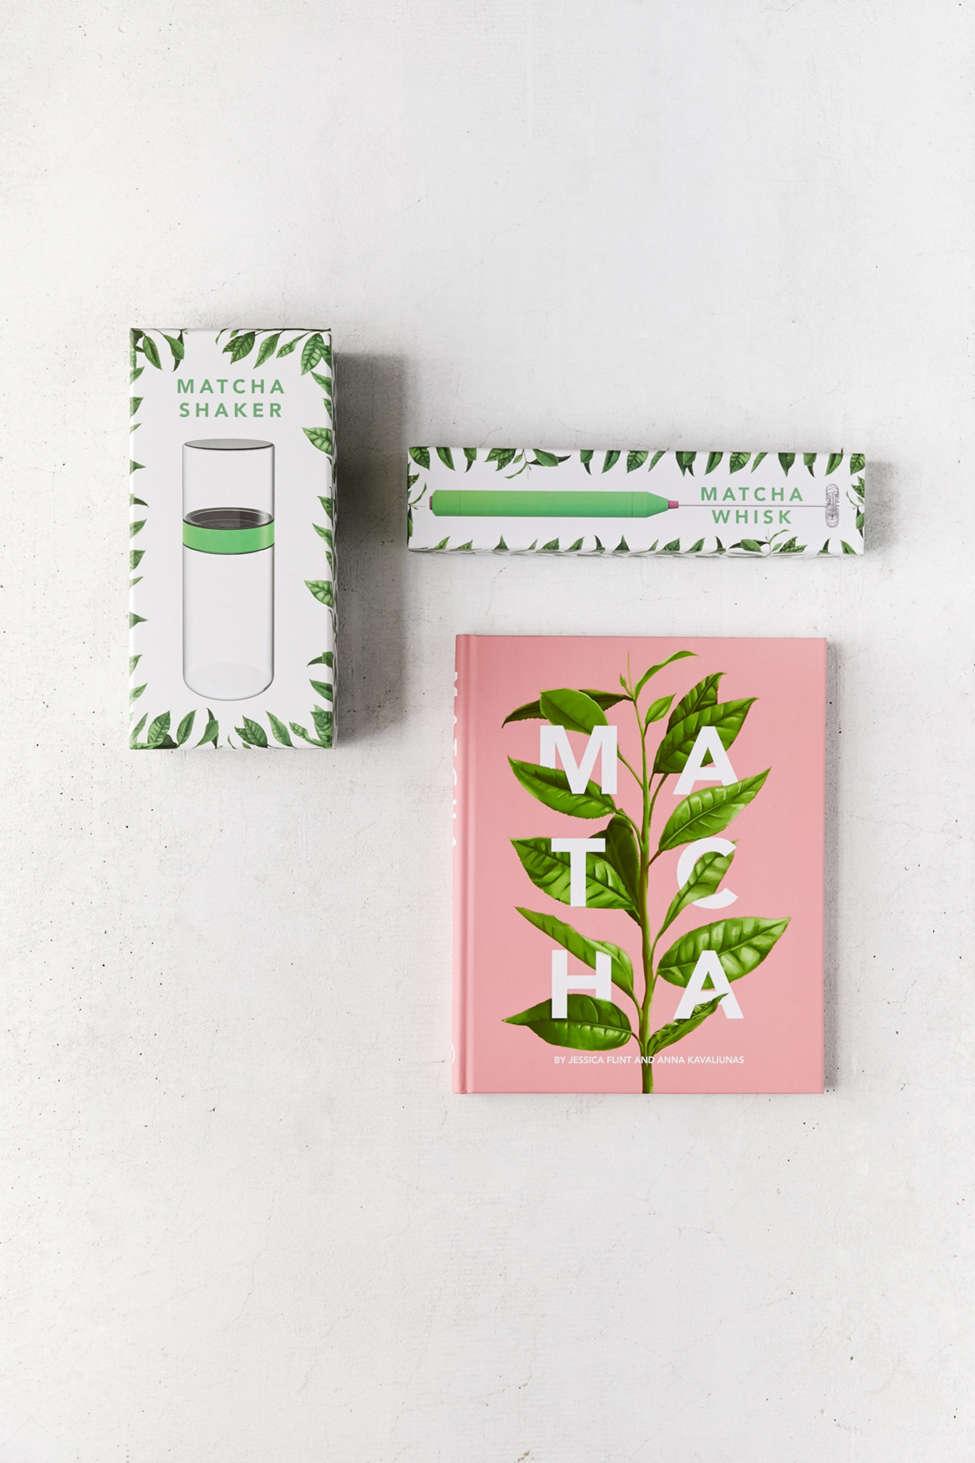 Slide View: 2: Matcha Book, Whisk + Shaker Gift Set